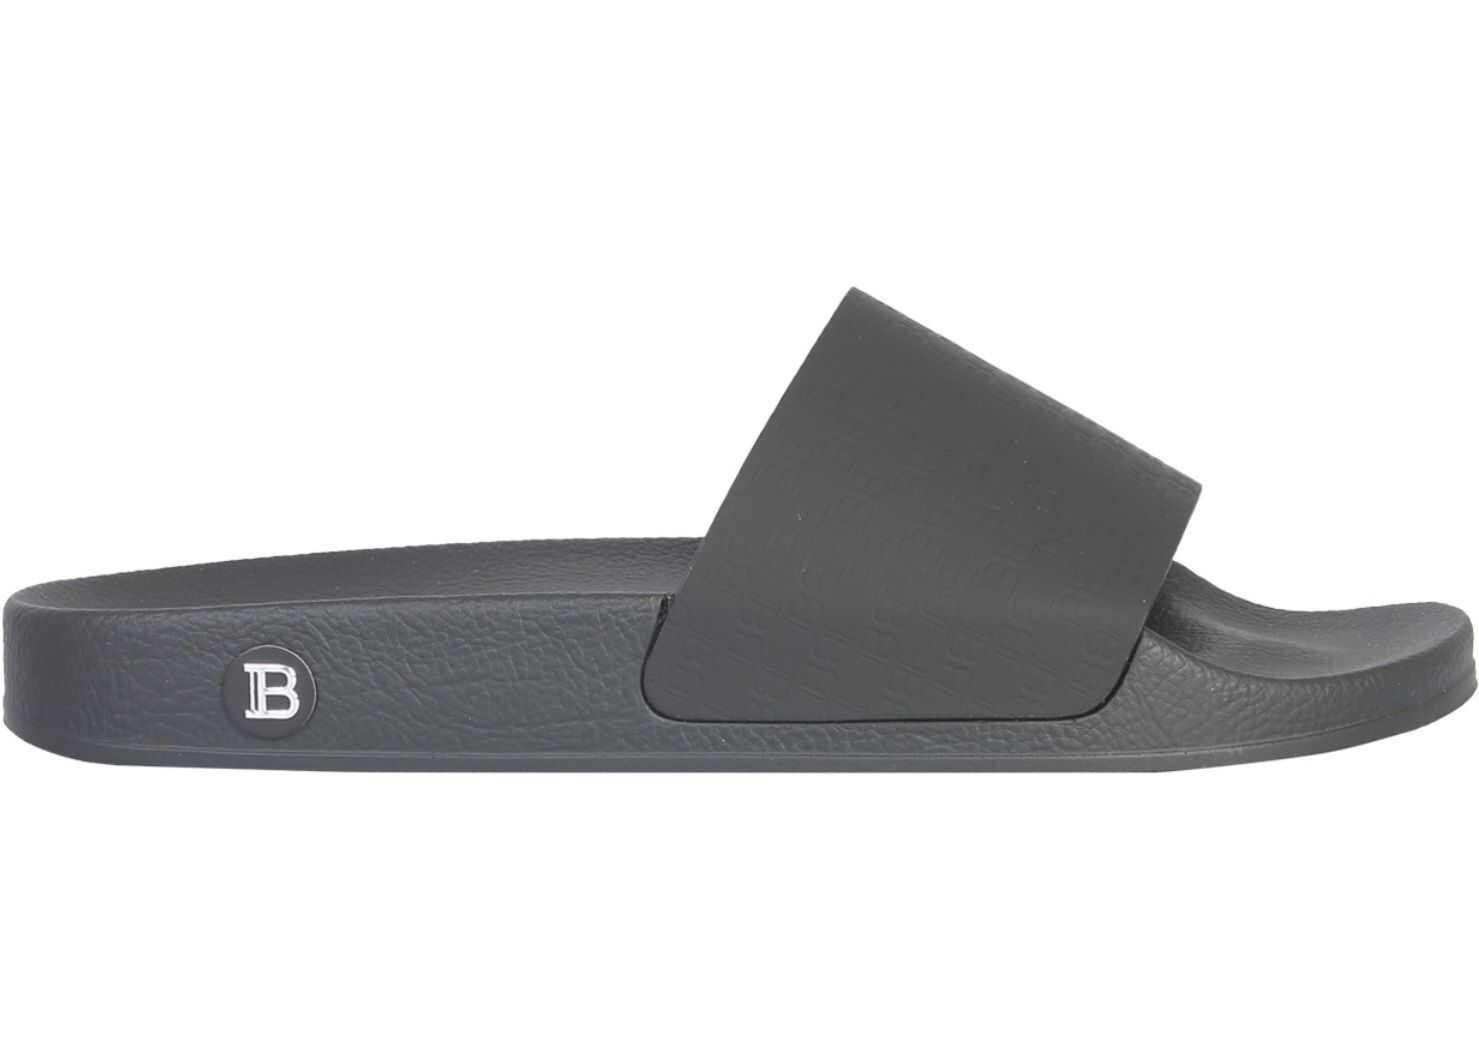 Balmain Slide Calypso Sandal BLACK